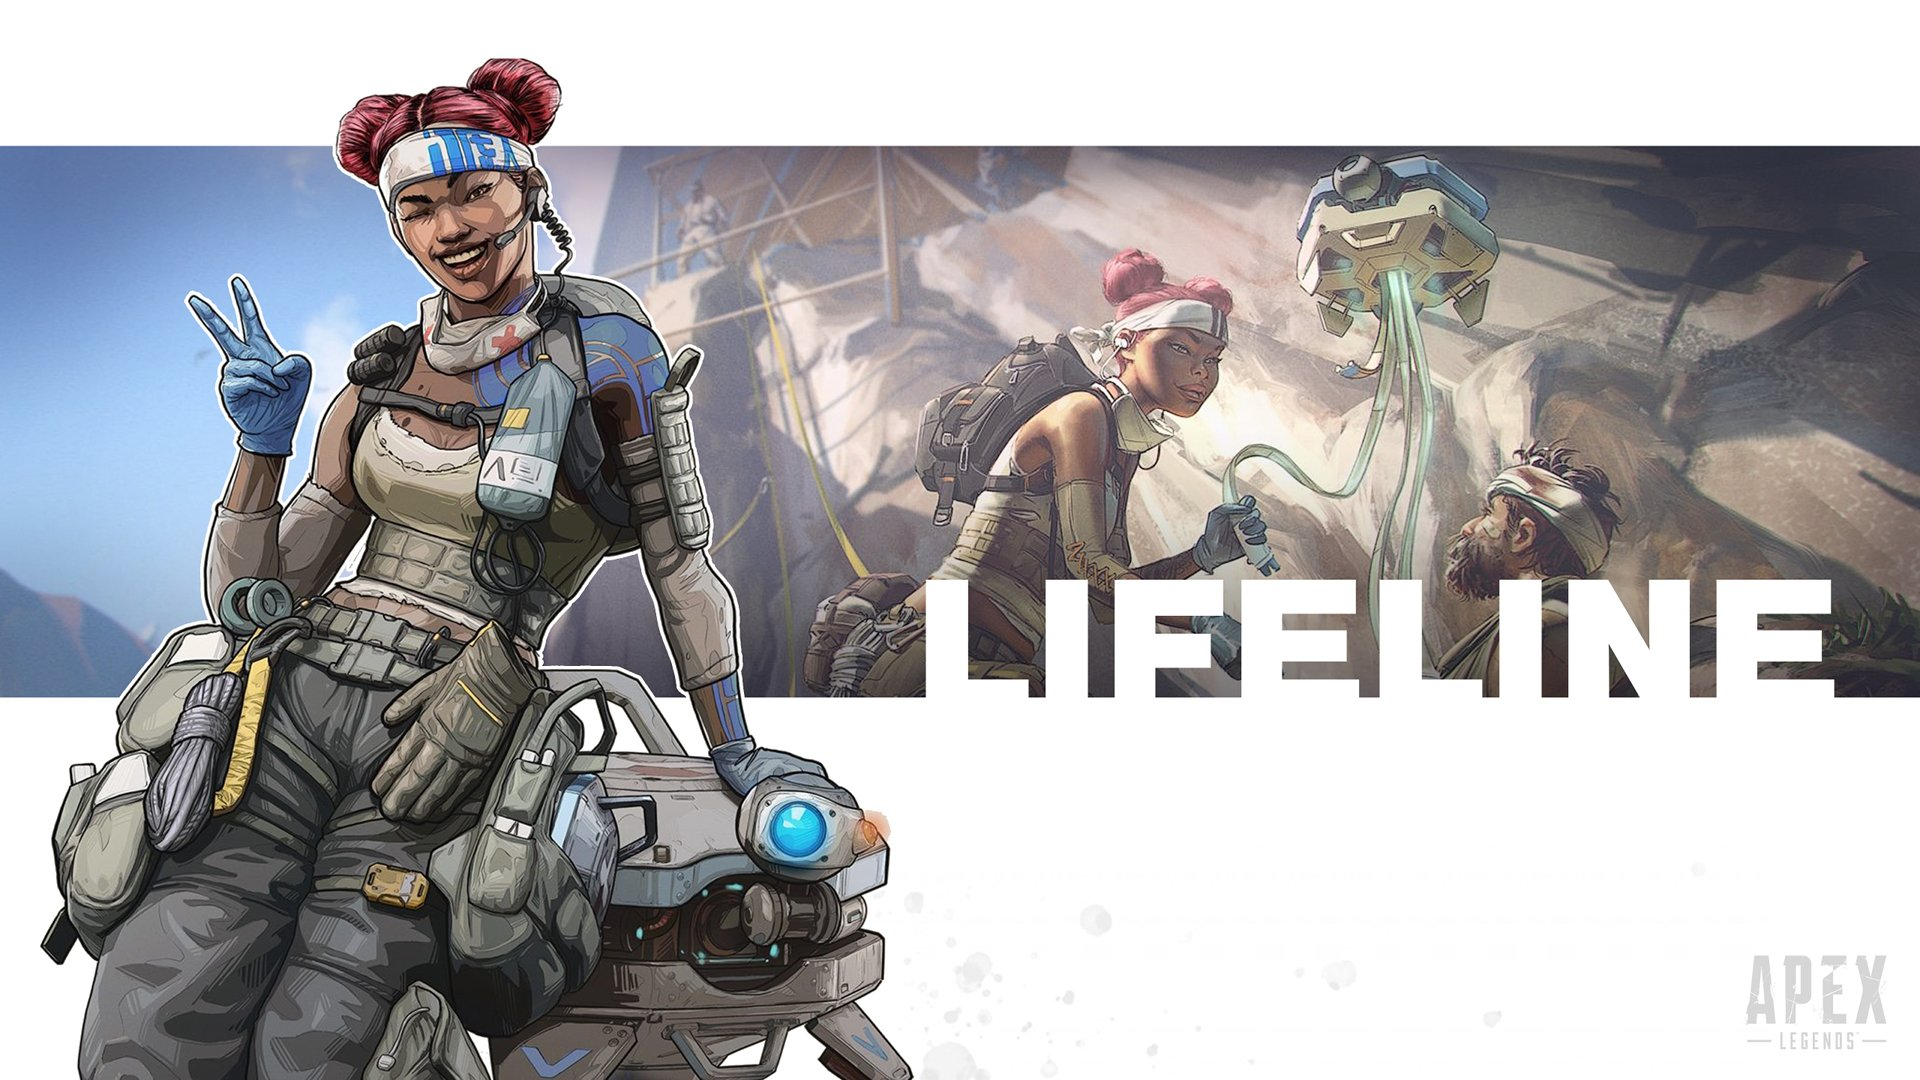 Apex Legends Lifeline Wallpaper 67149 1920x1080px